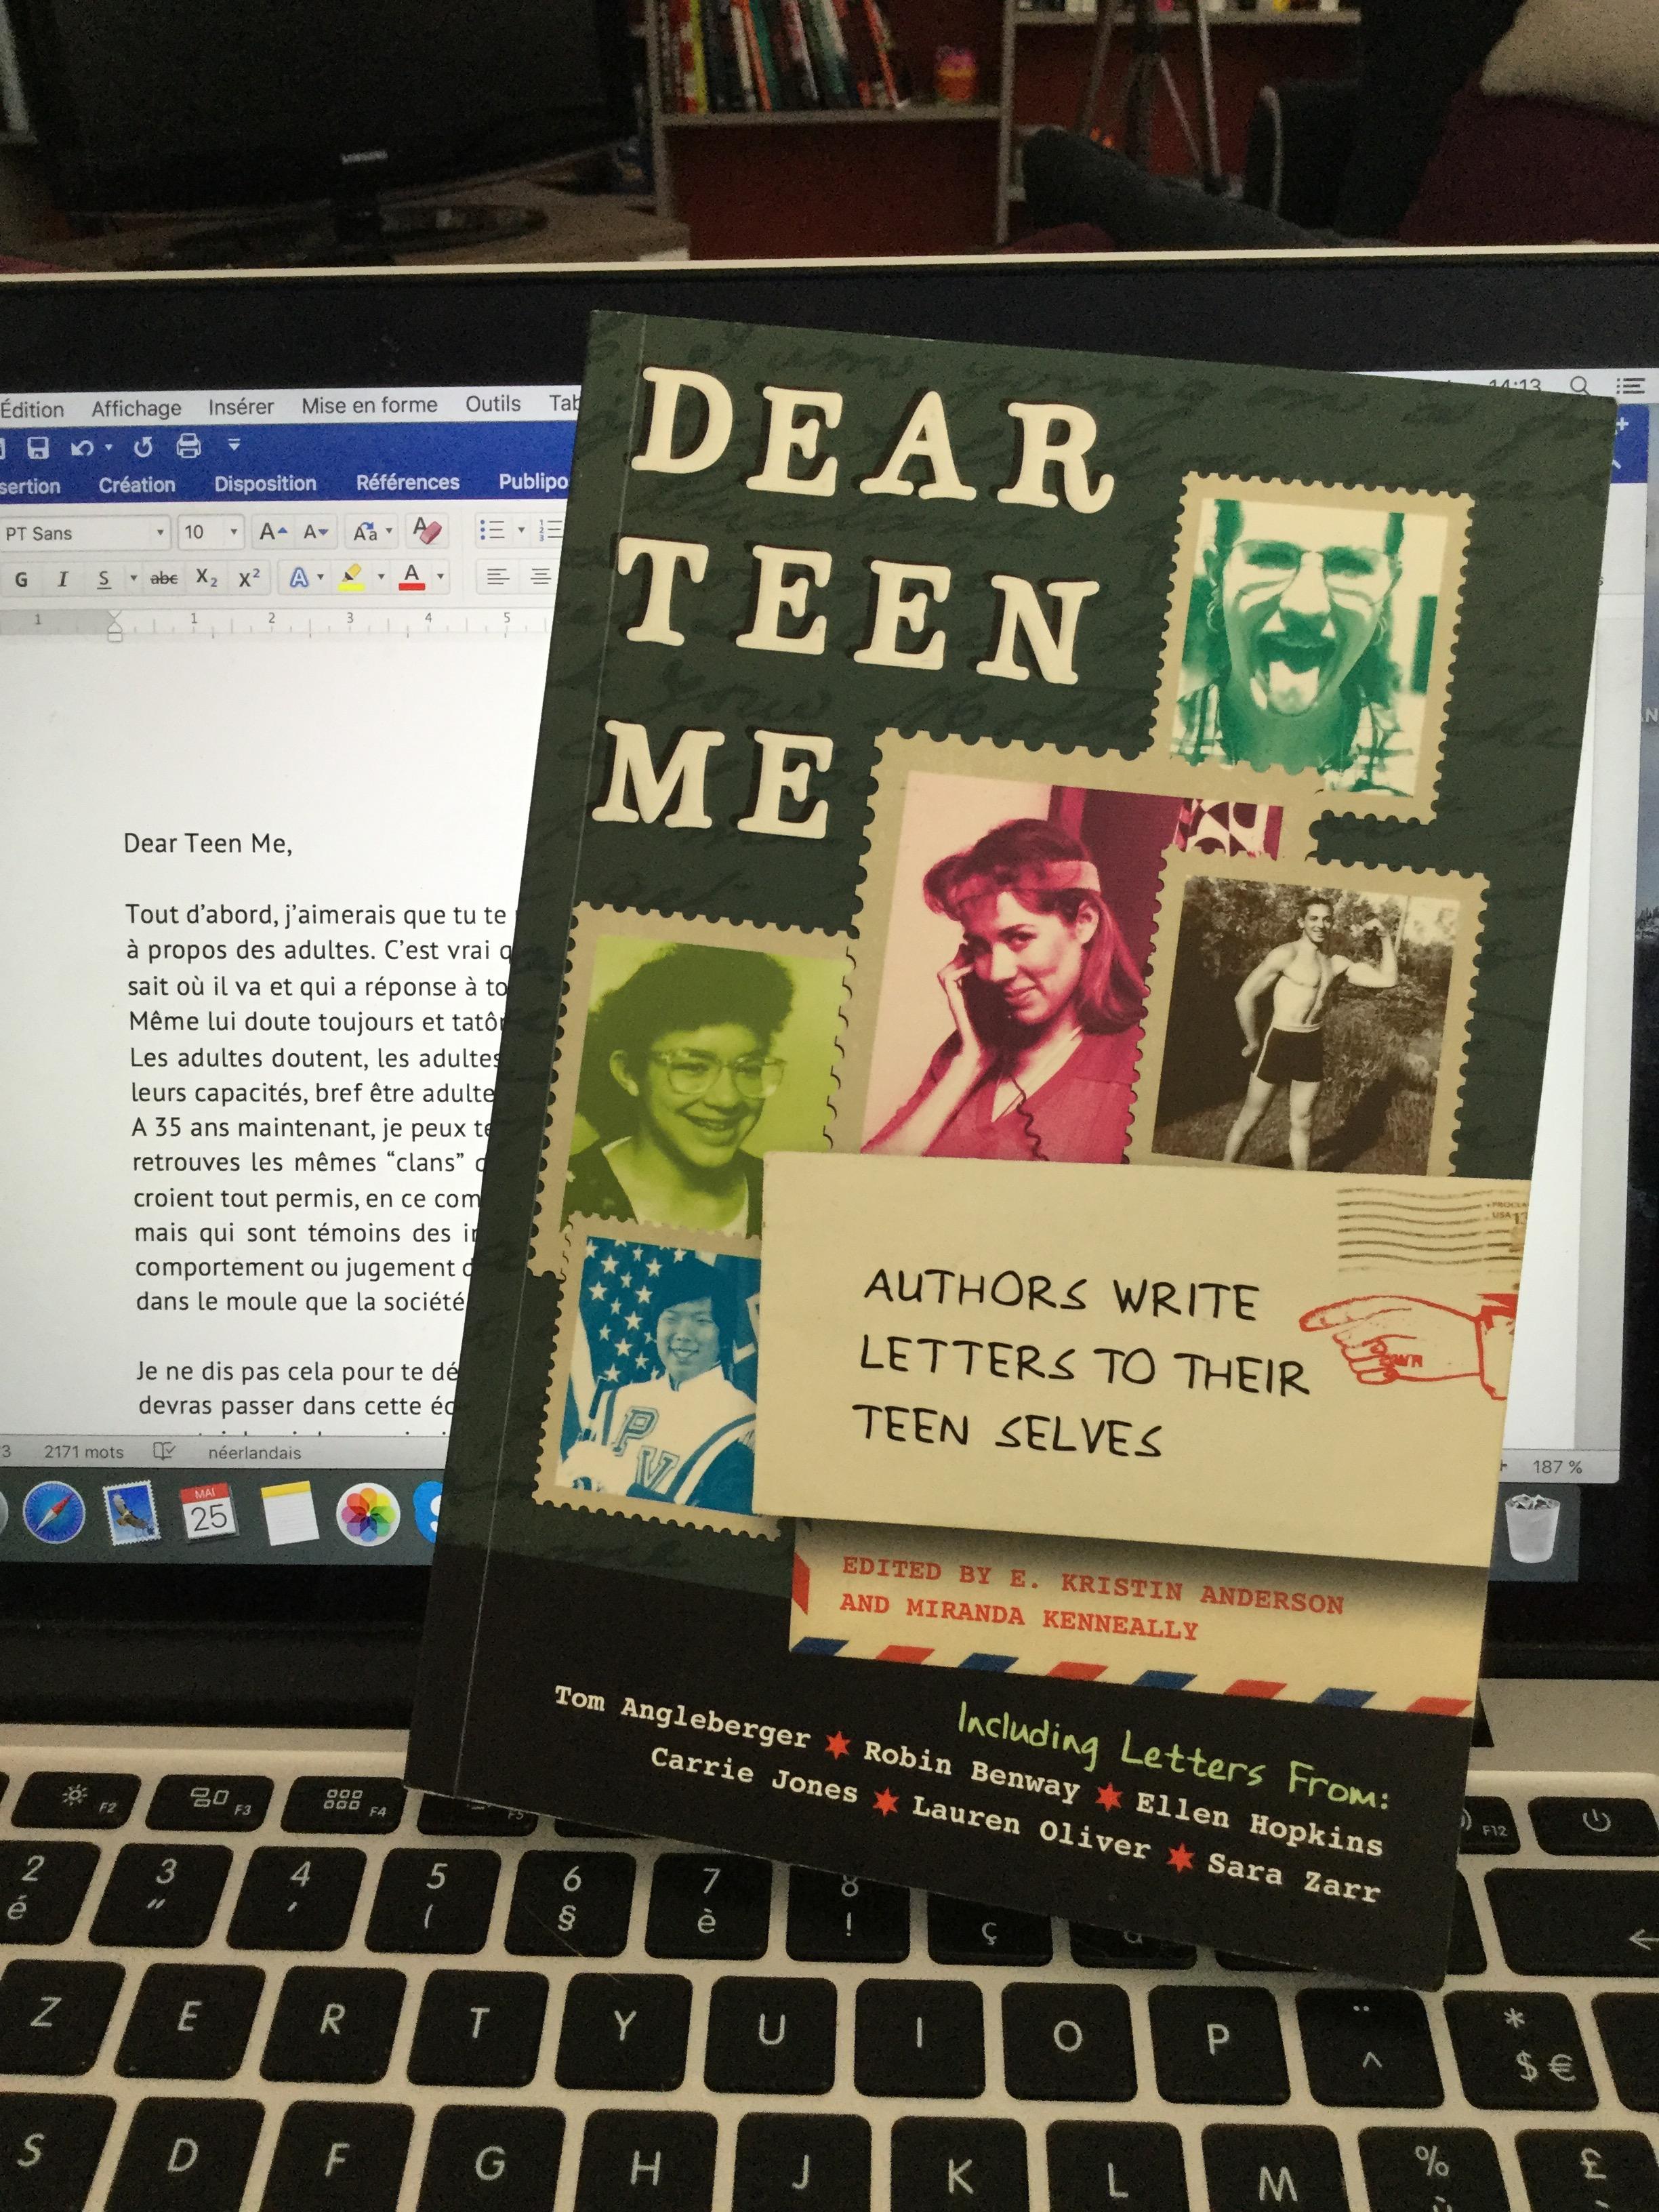 Dear Teen Me…